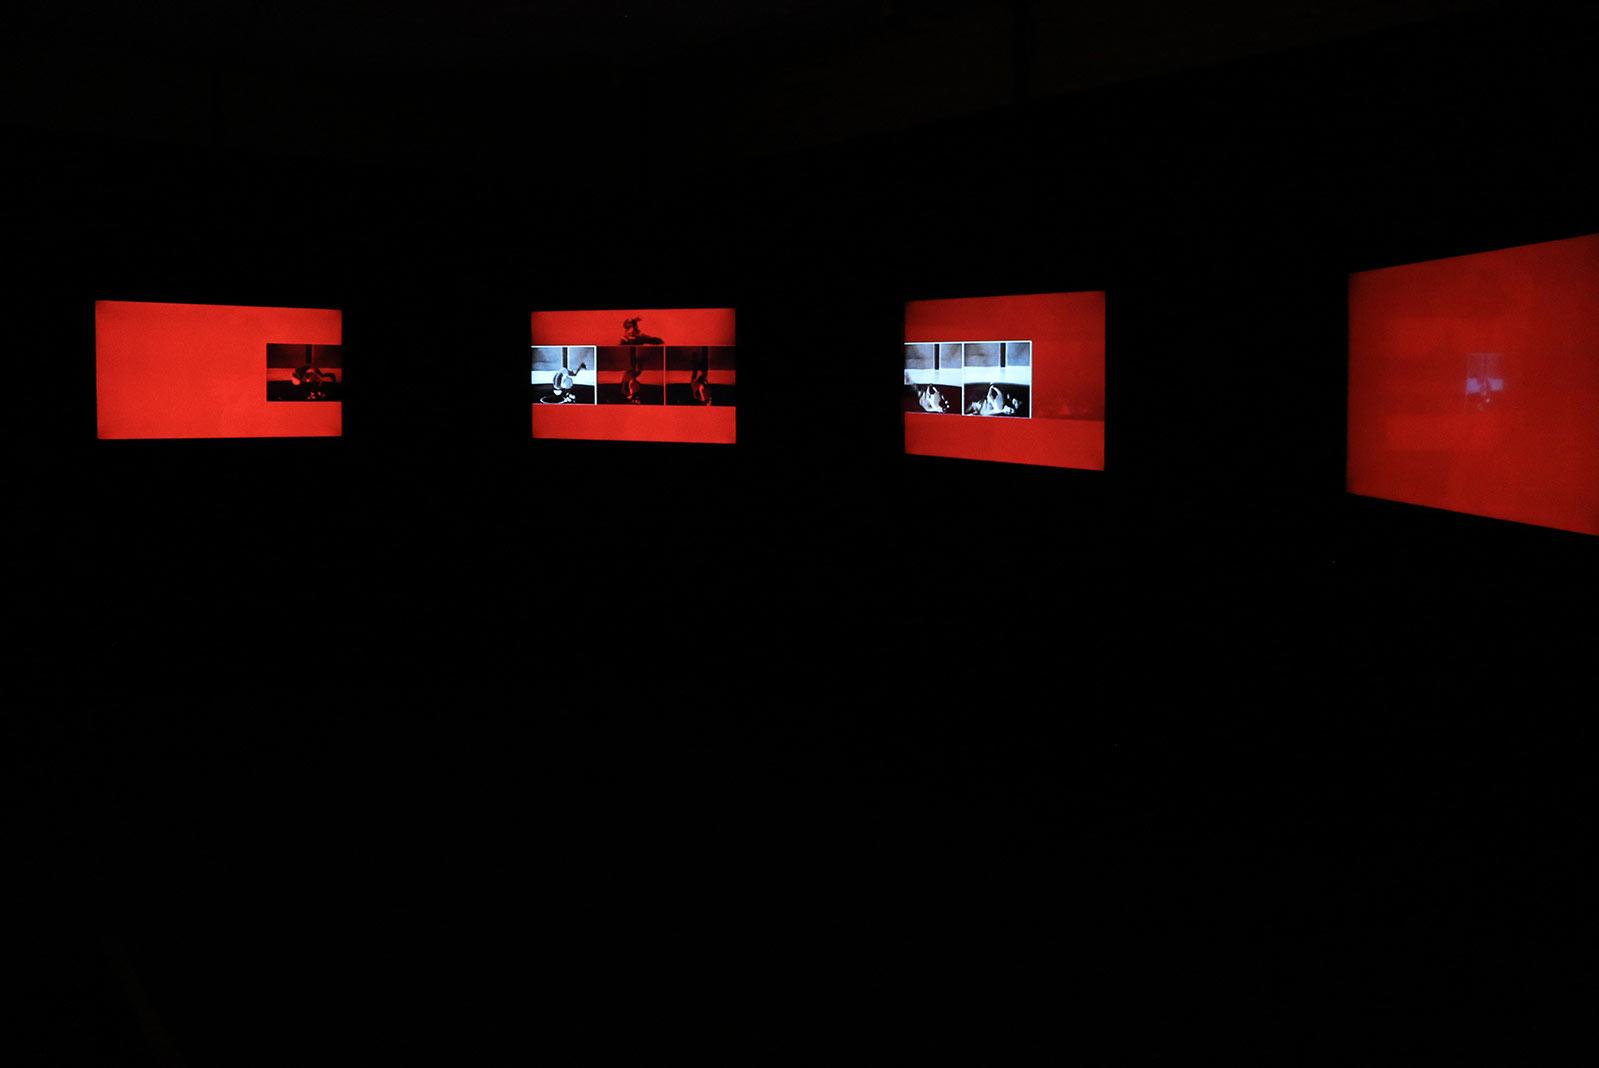 pulse, 7-Kanal-Found-Footage-Videocollage, 2019, Dominik Geis